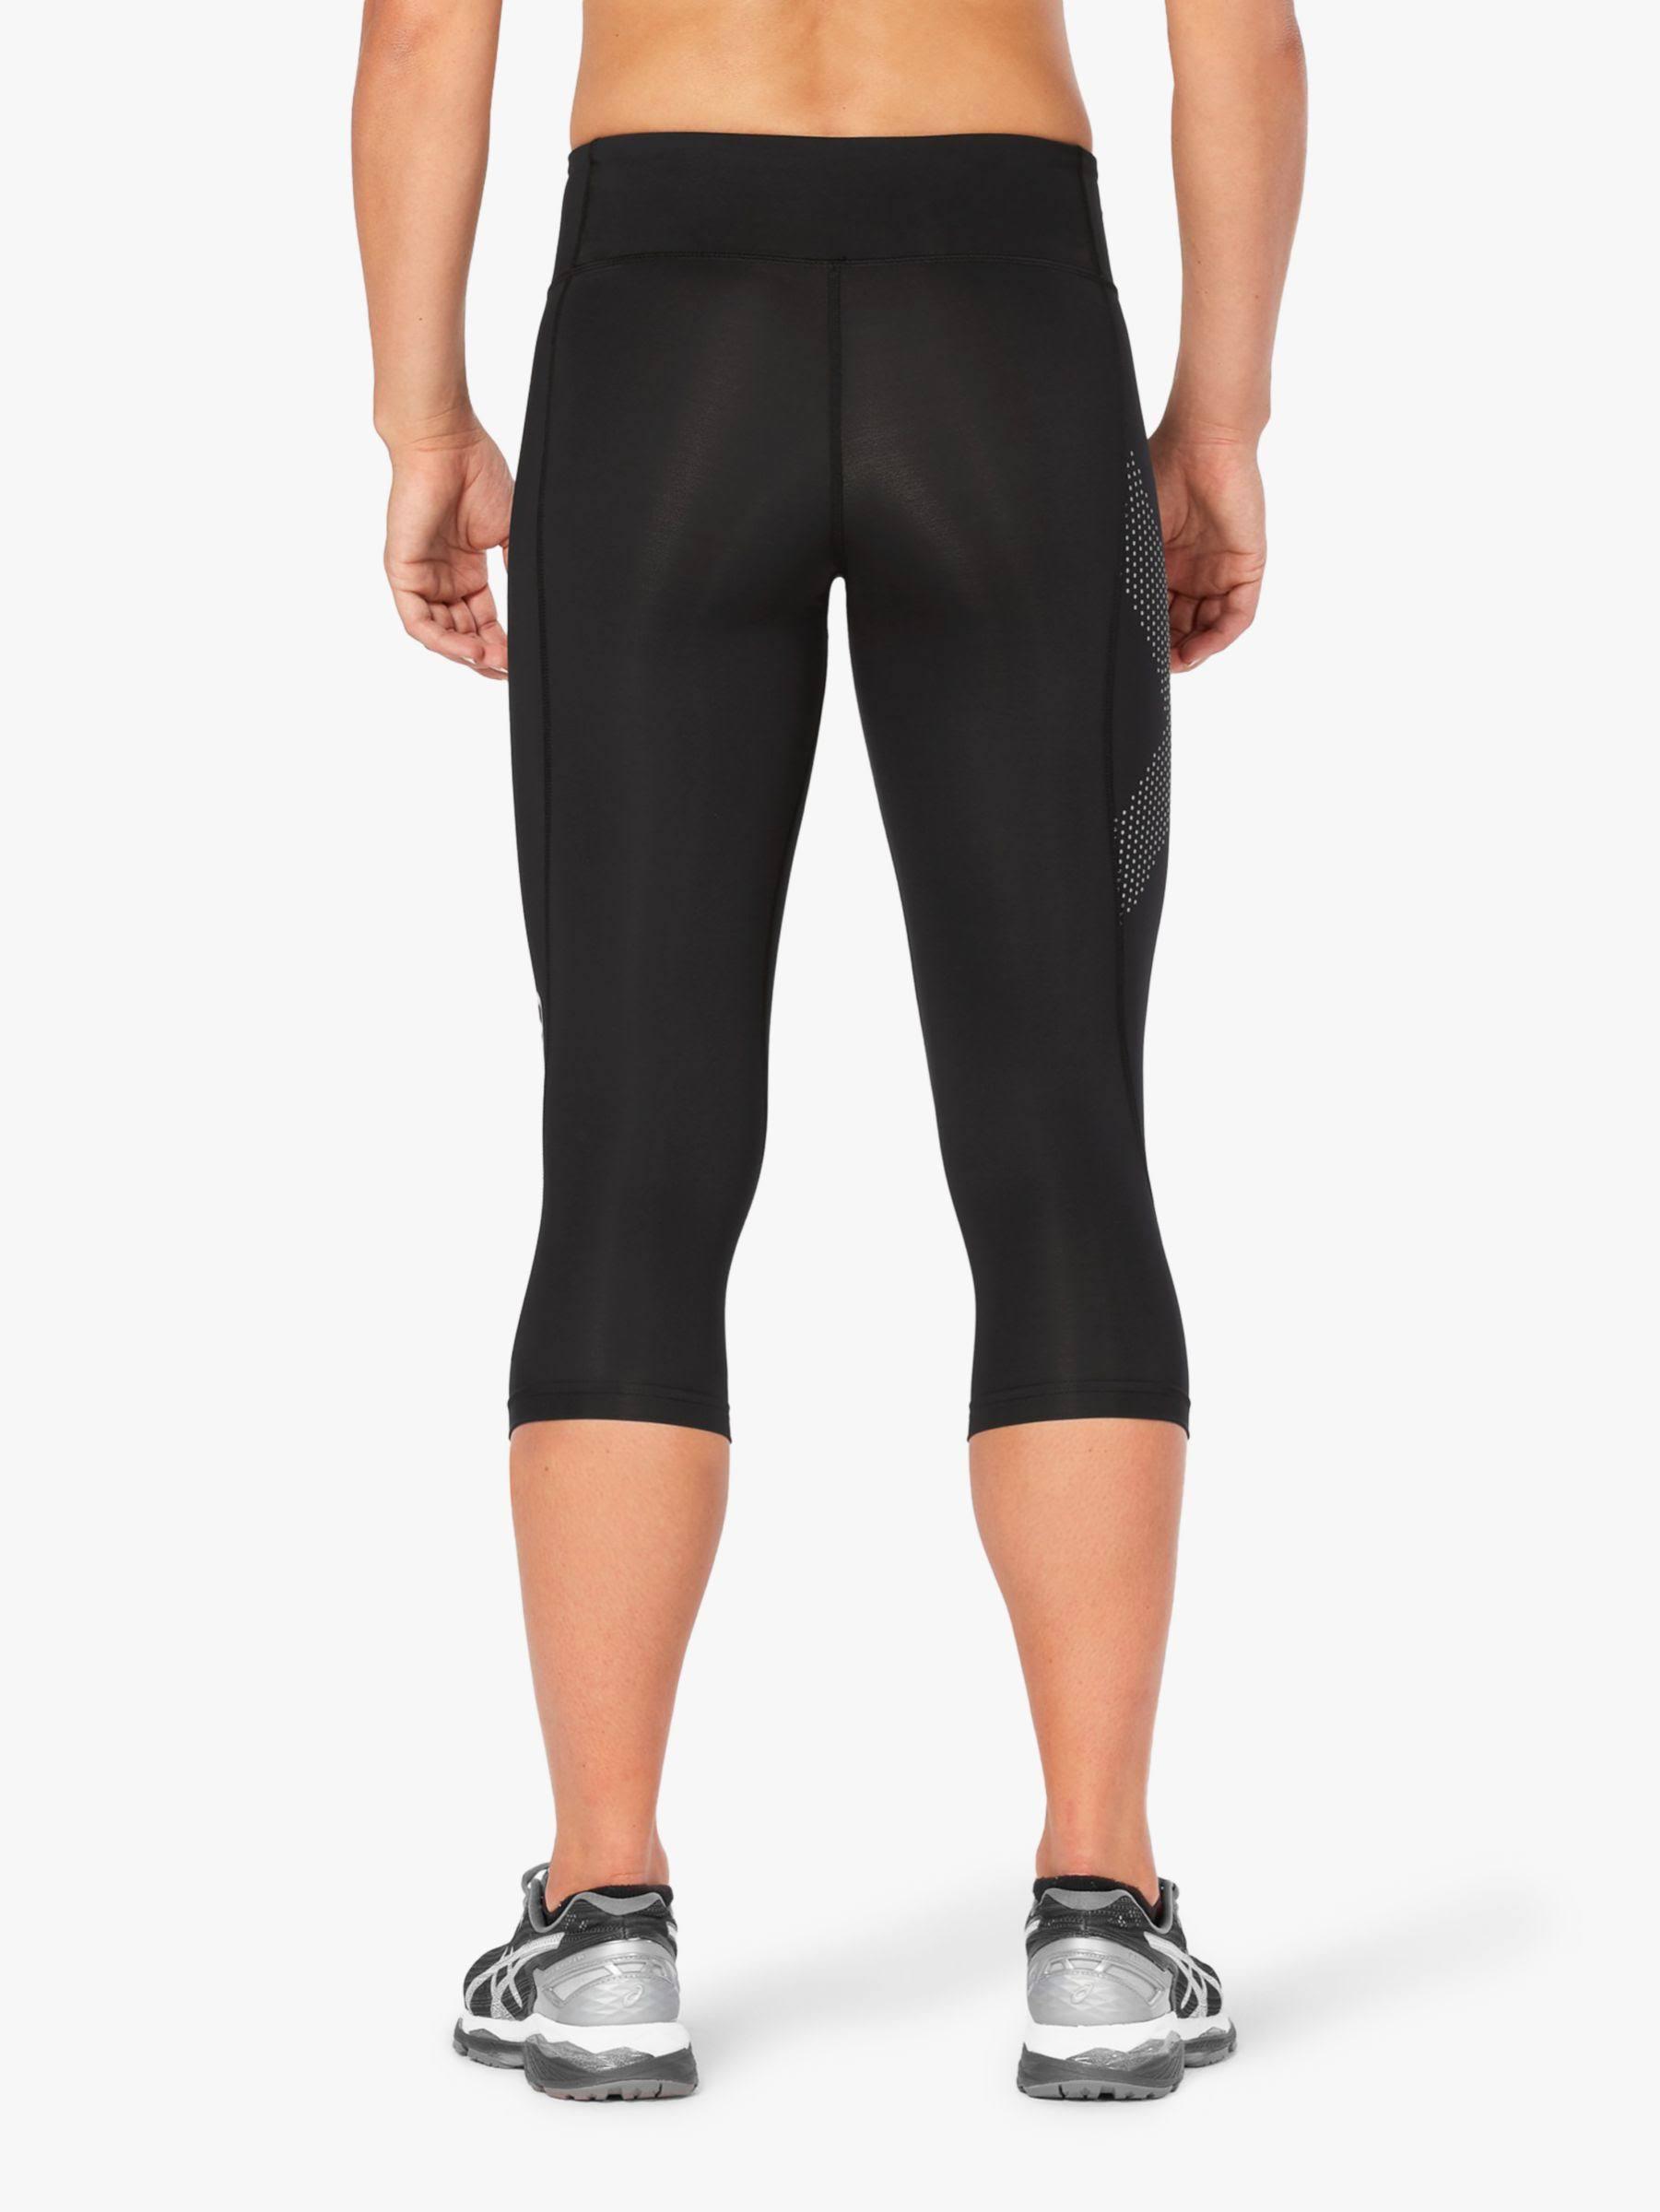 2XU mid-rise Compression Womens 3/4 Capri Tights - Black